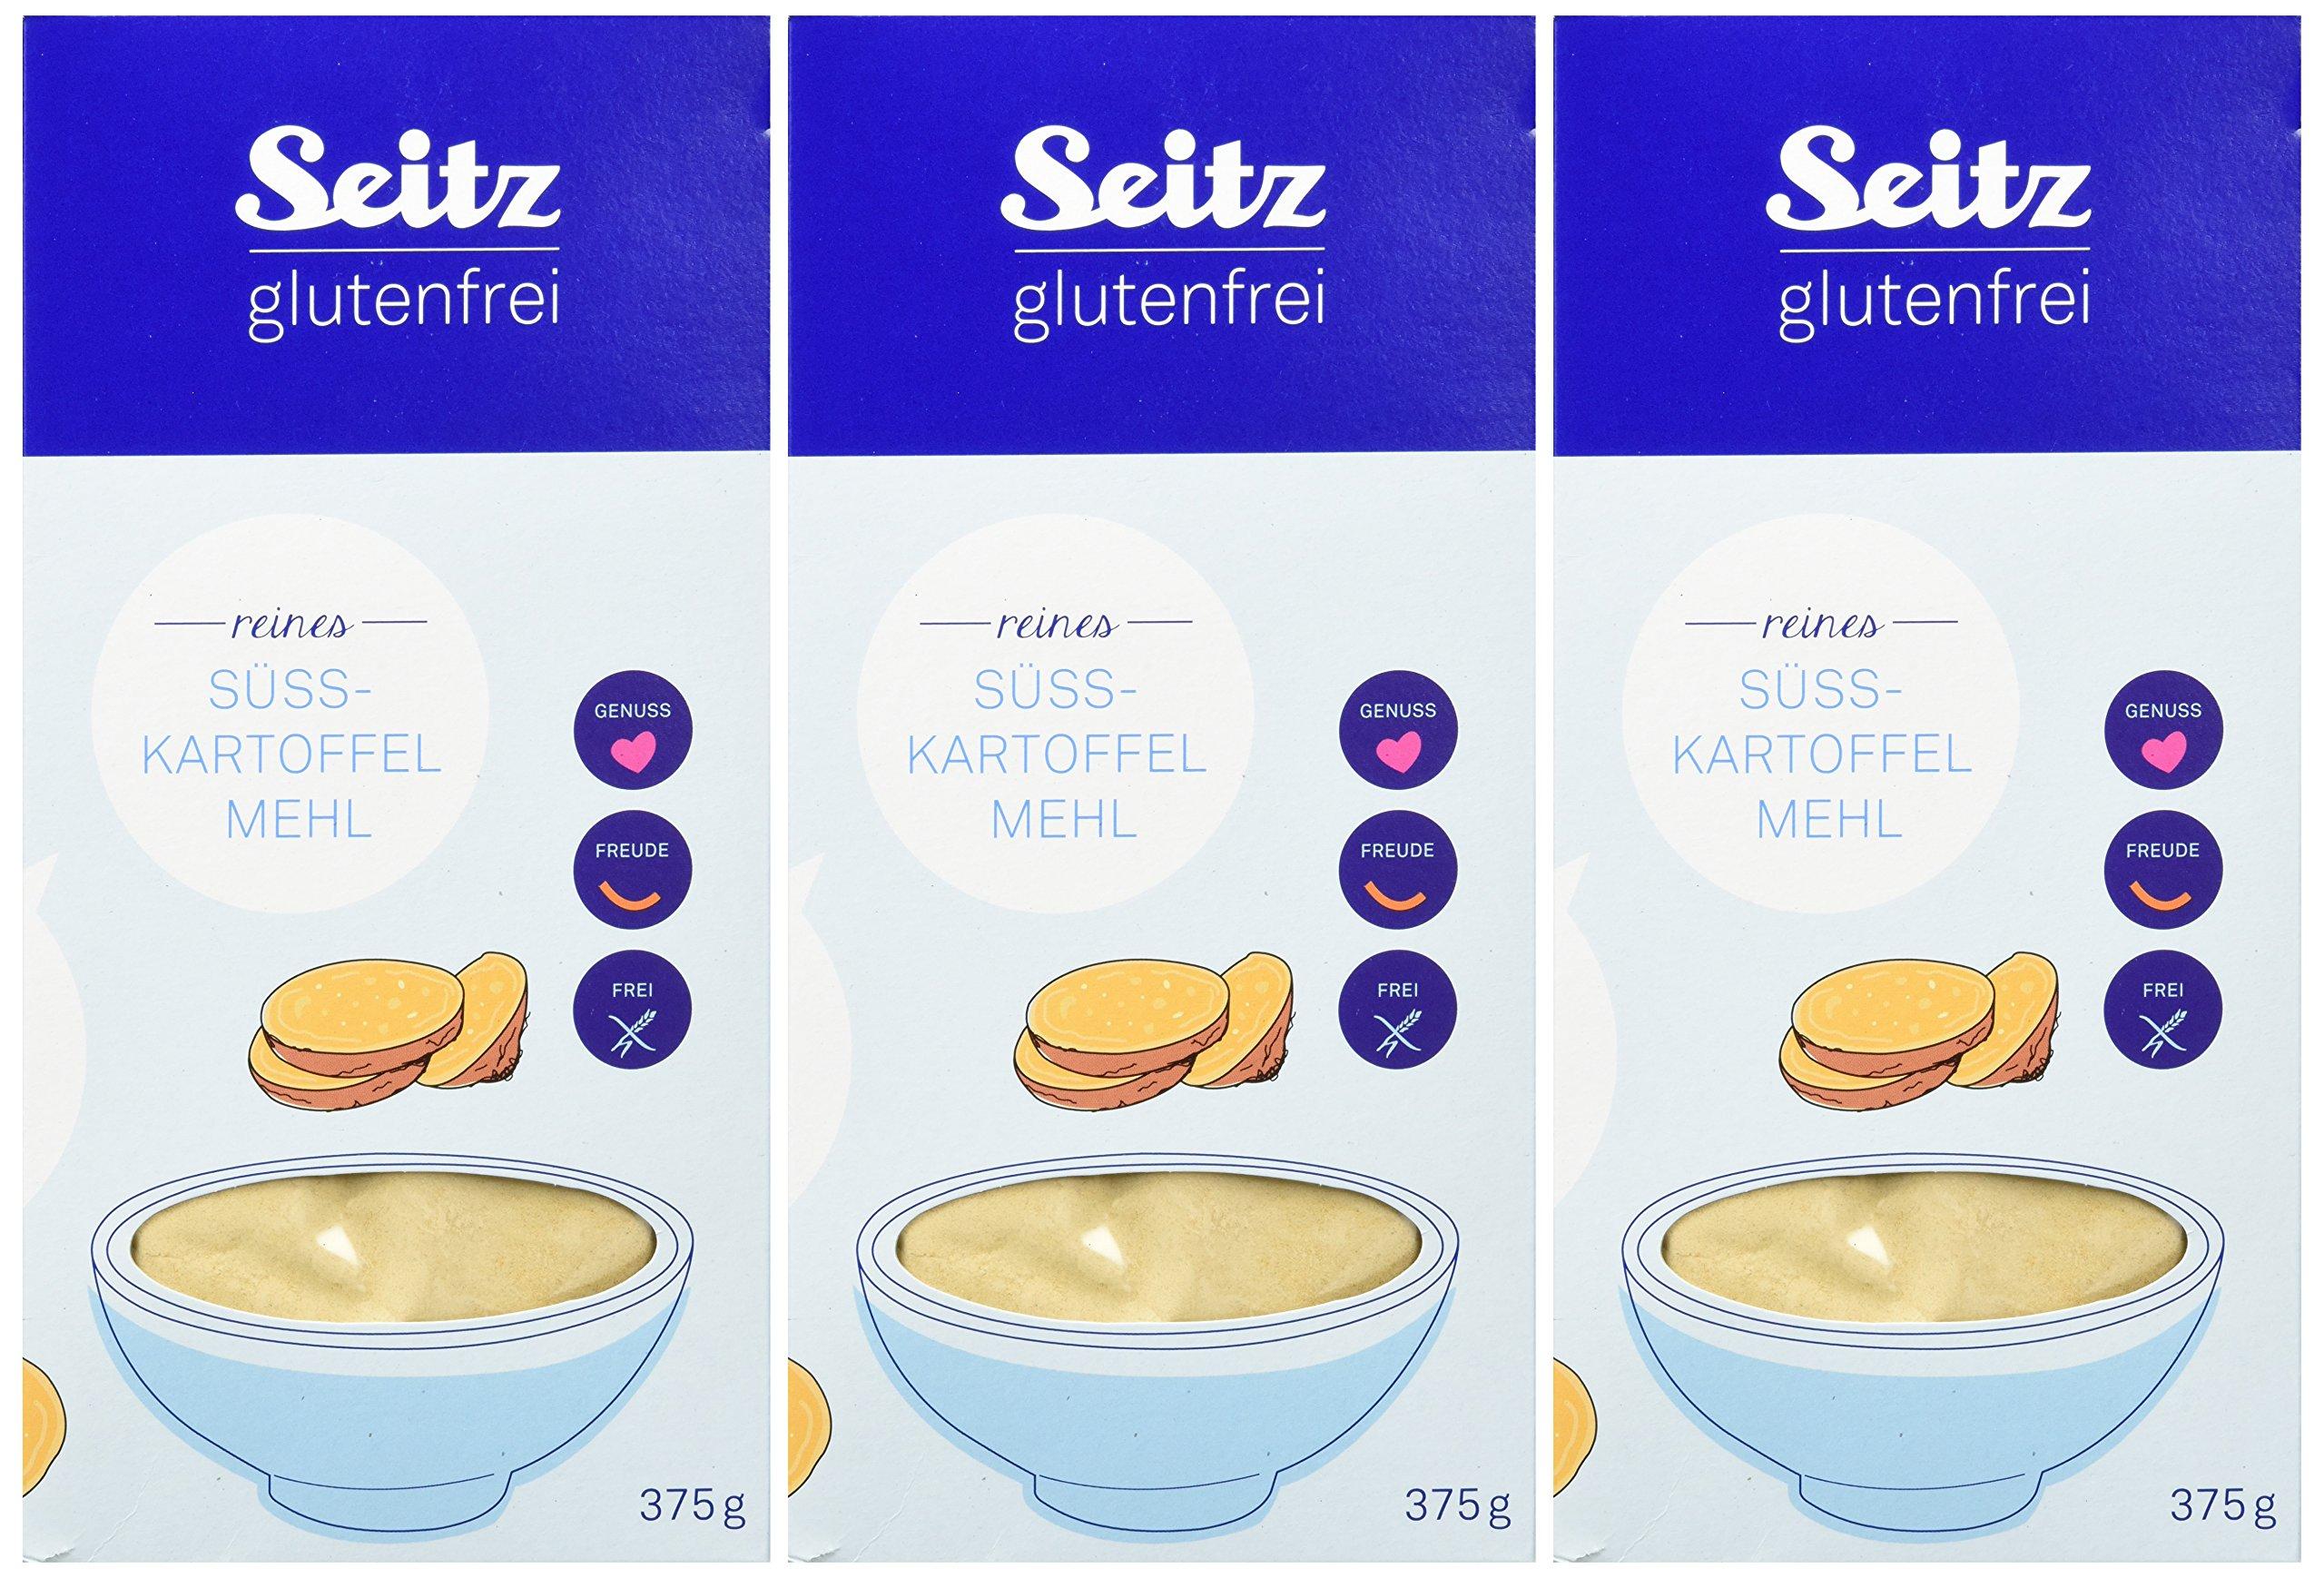 Seitz Gluten Free Sweet Potato Flour Pack Of 3 3 X 375 G Cheap Shopping Deli Berlin Cooking Ideas Recipes